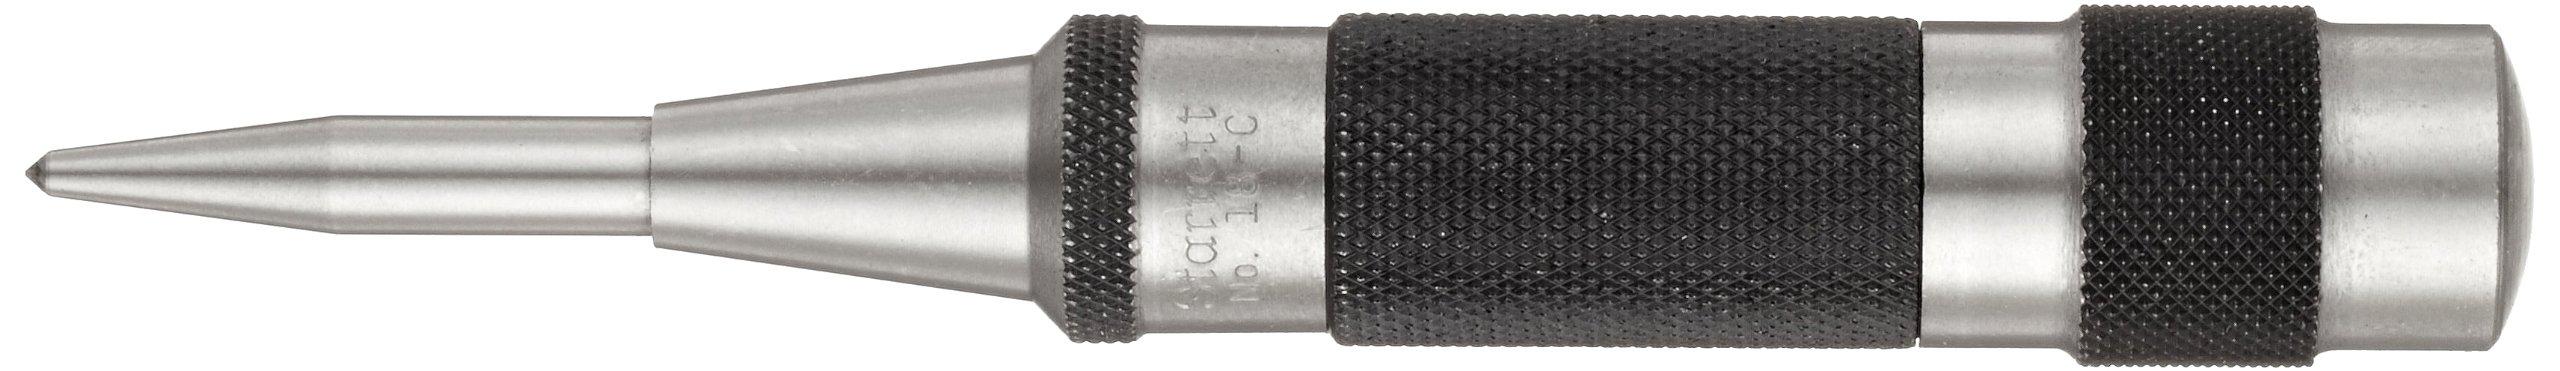 Starrett 18C Automatic Center Punch Heavy-Duty With Adjustable Stroke, 5-1/4'' Length, 11/16'' Diameter by Starrett (Image #1)